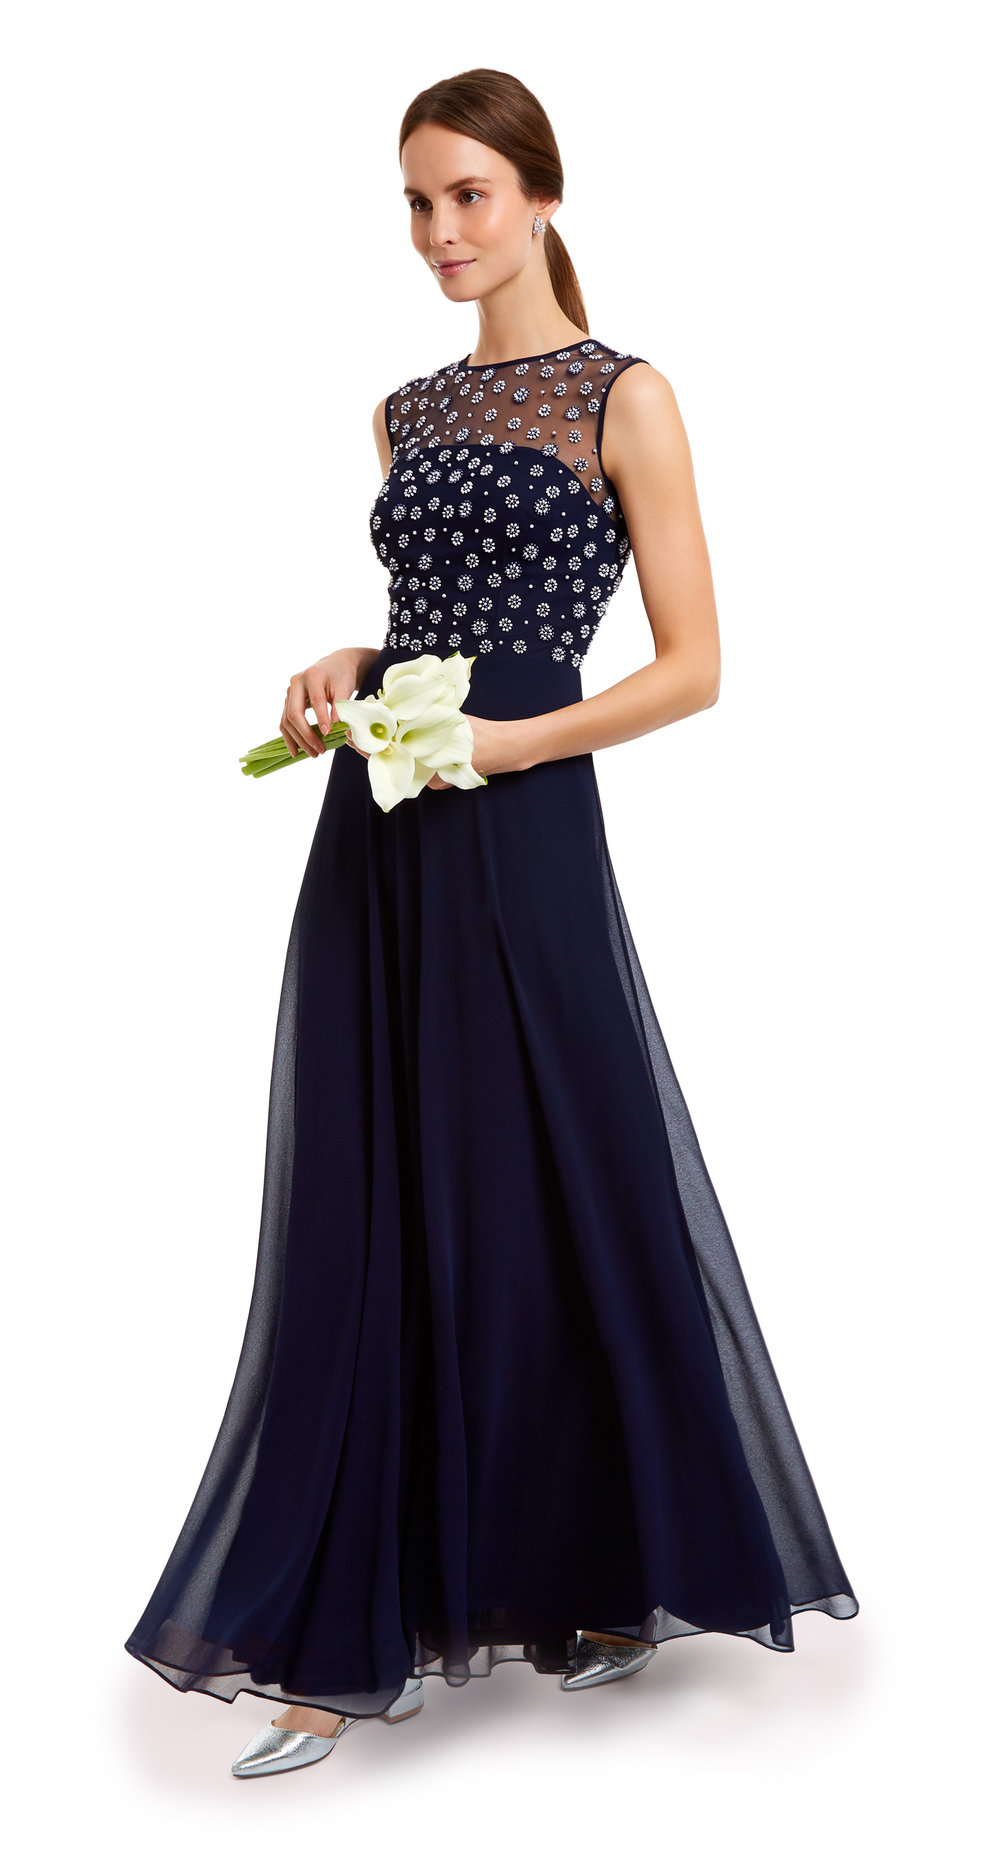 motee-navy-bridesmaid-dress.jpg